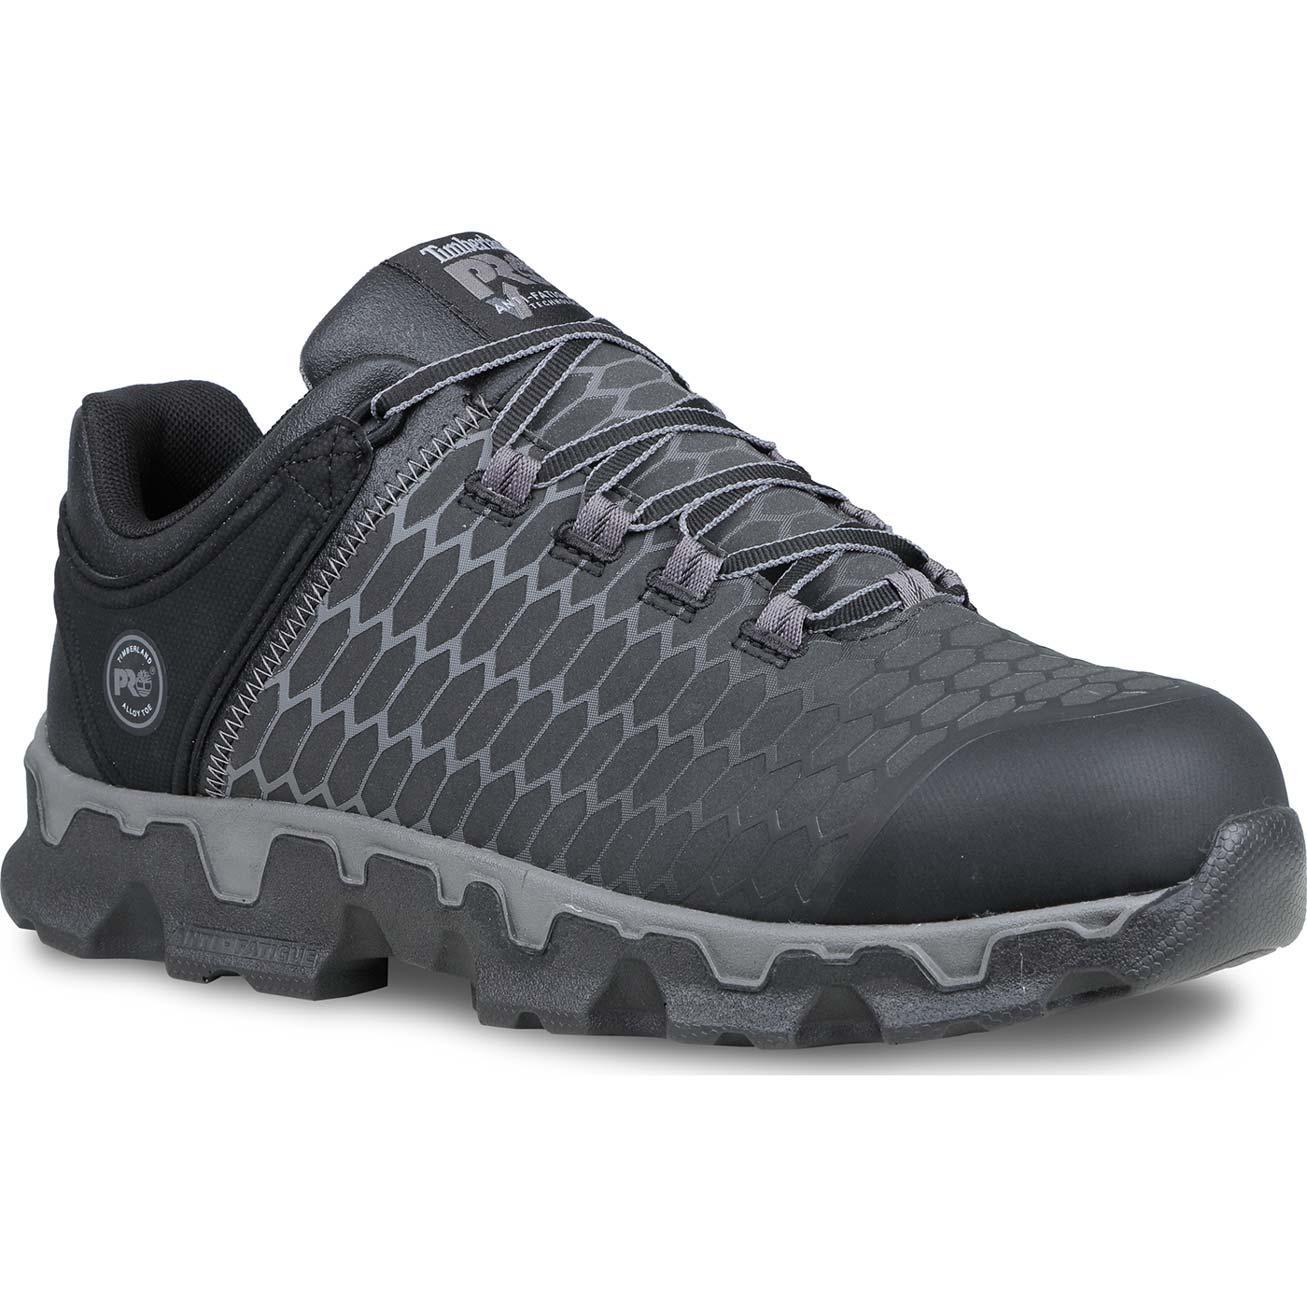 Timberland PRO Powertrain Sport Alloy Toe Work Shoe, , large